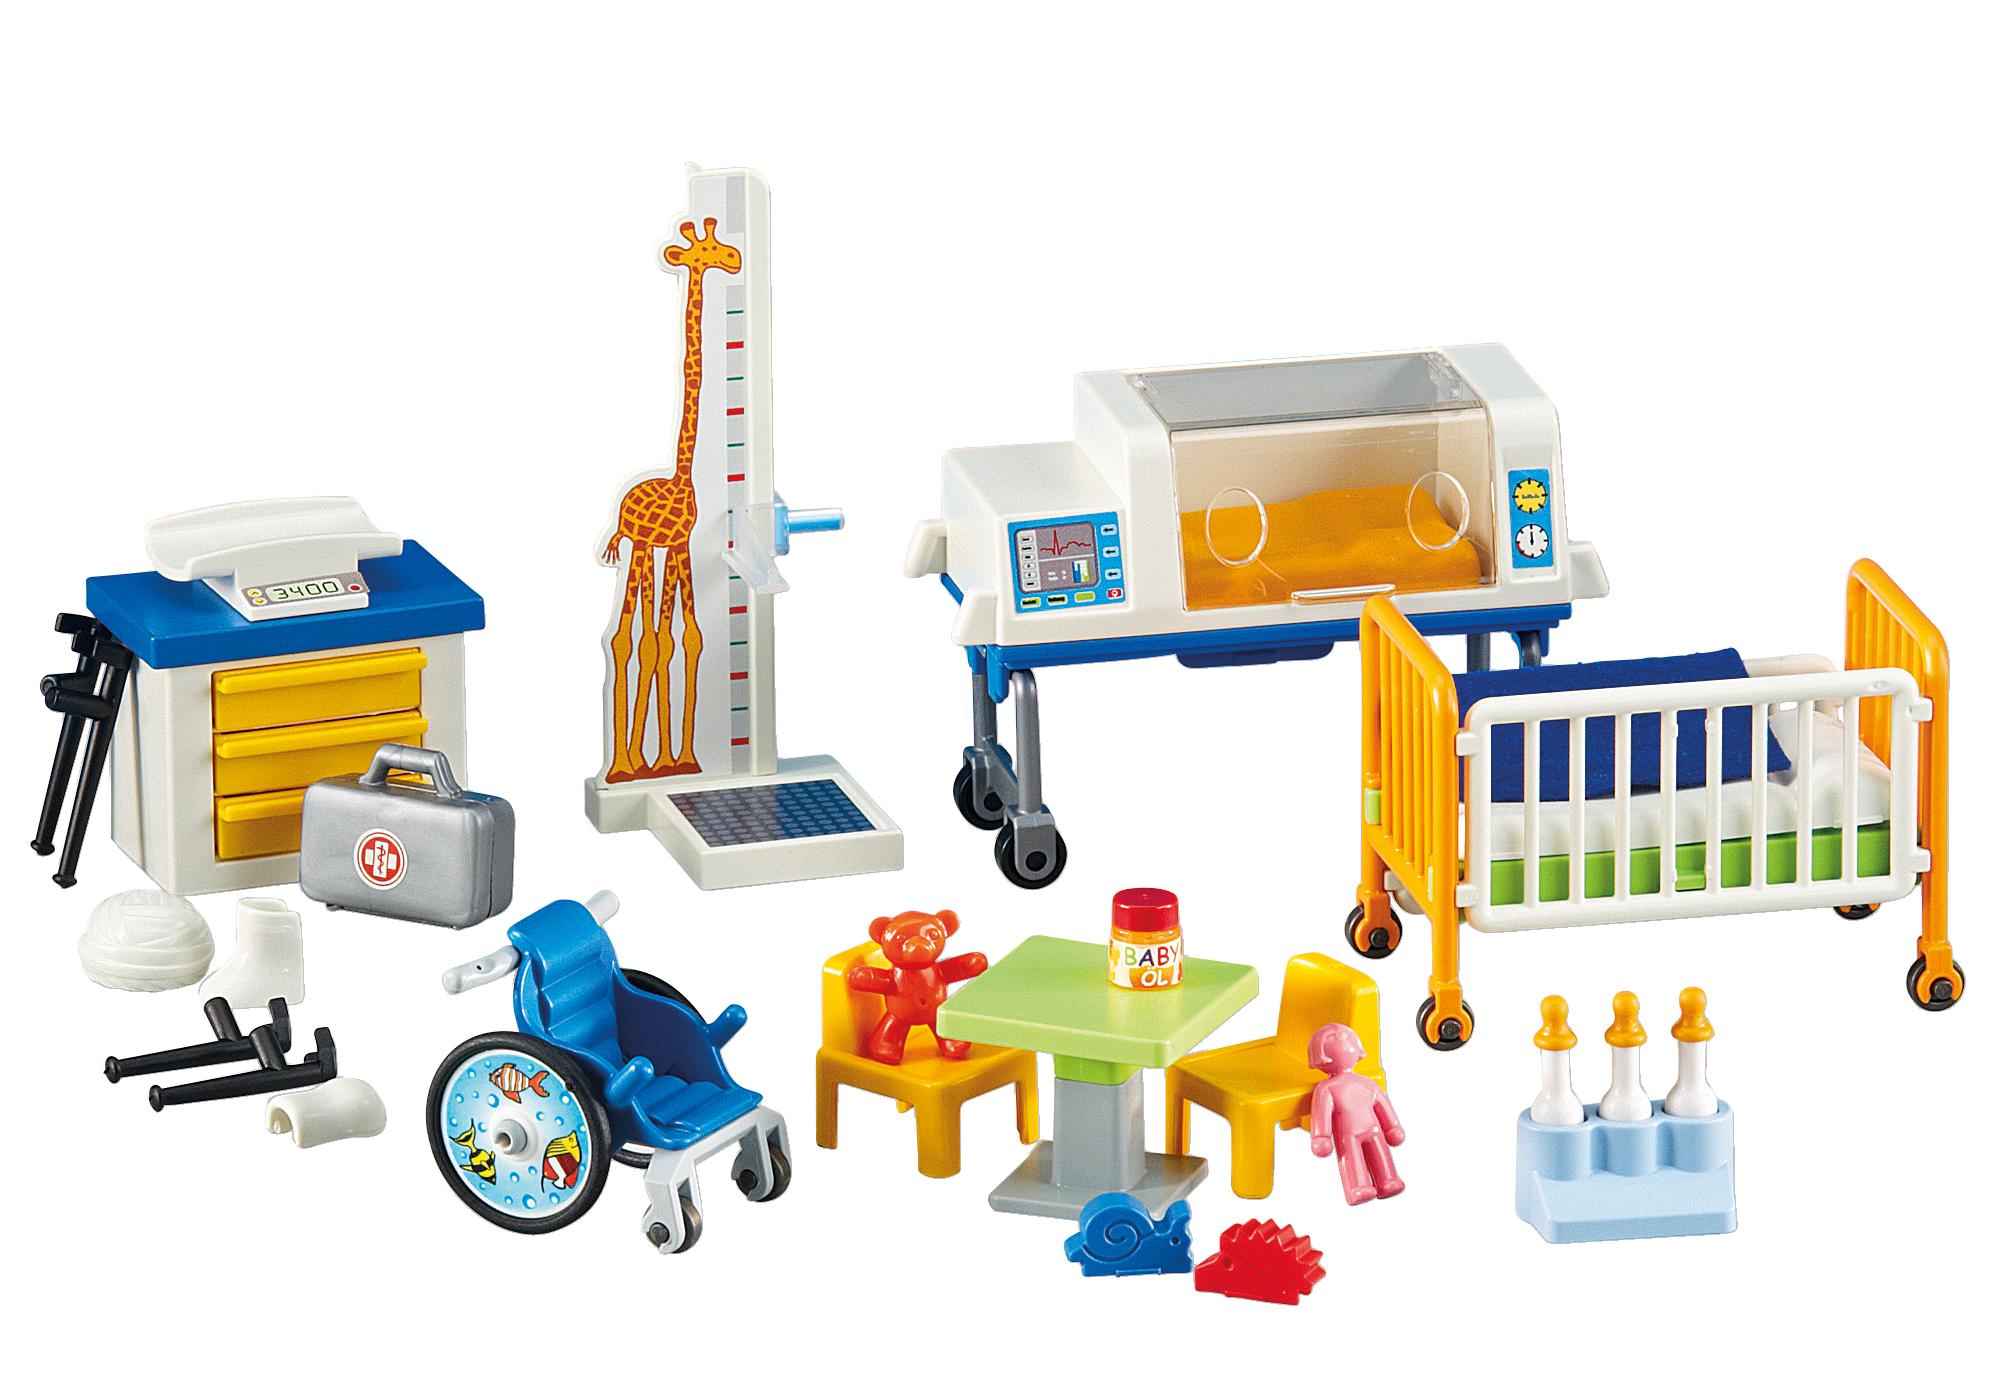 http://media.playmobil.com/i/playmobil/6295_product_detail/Reparto per bambini